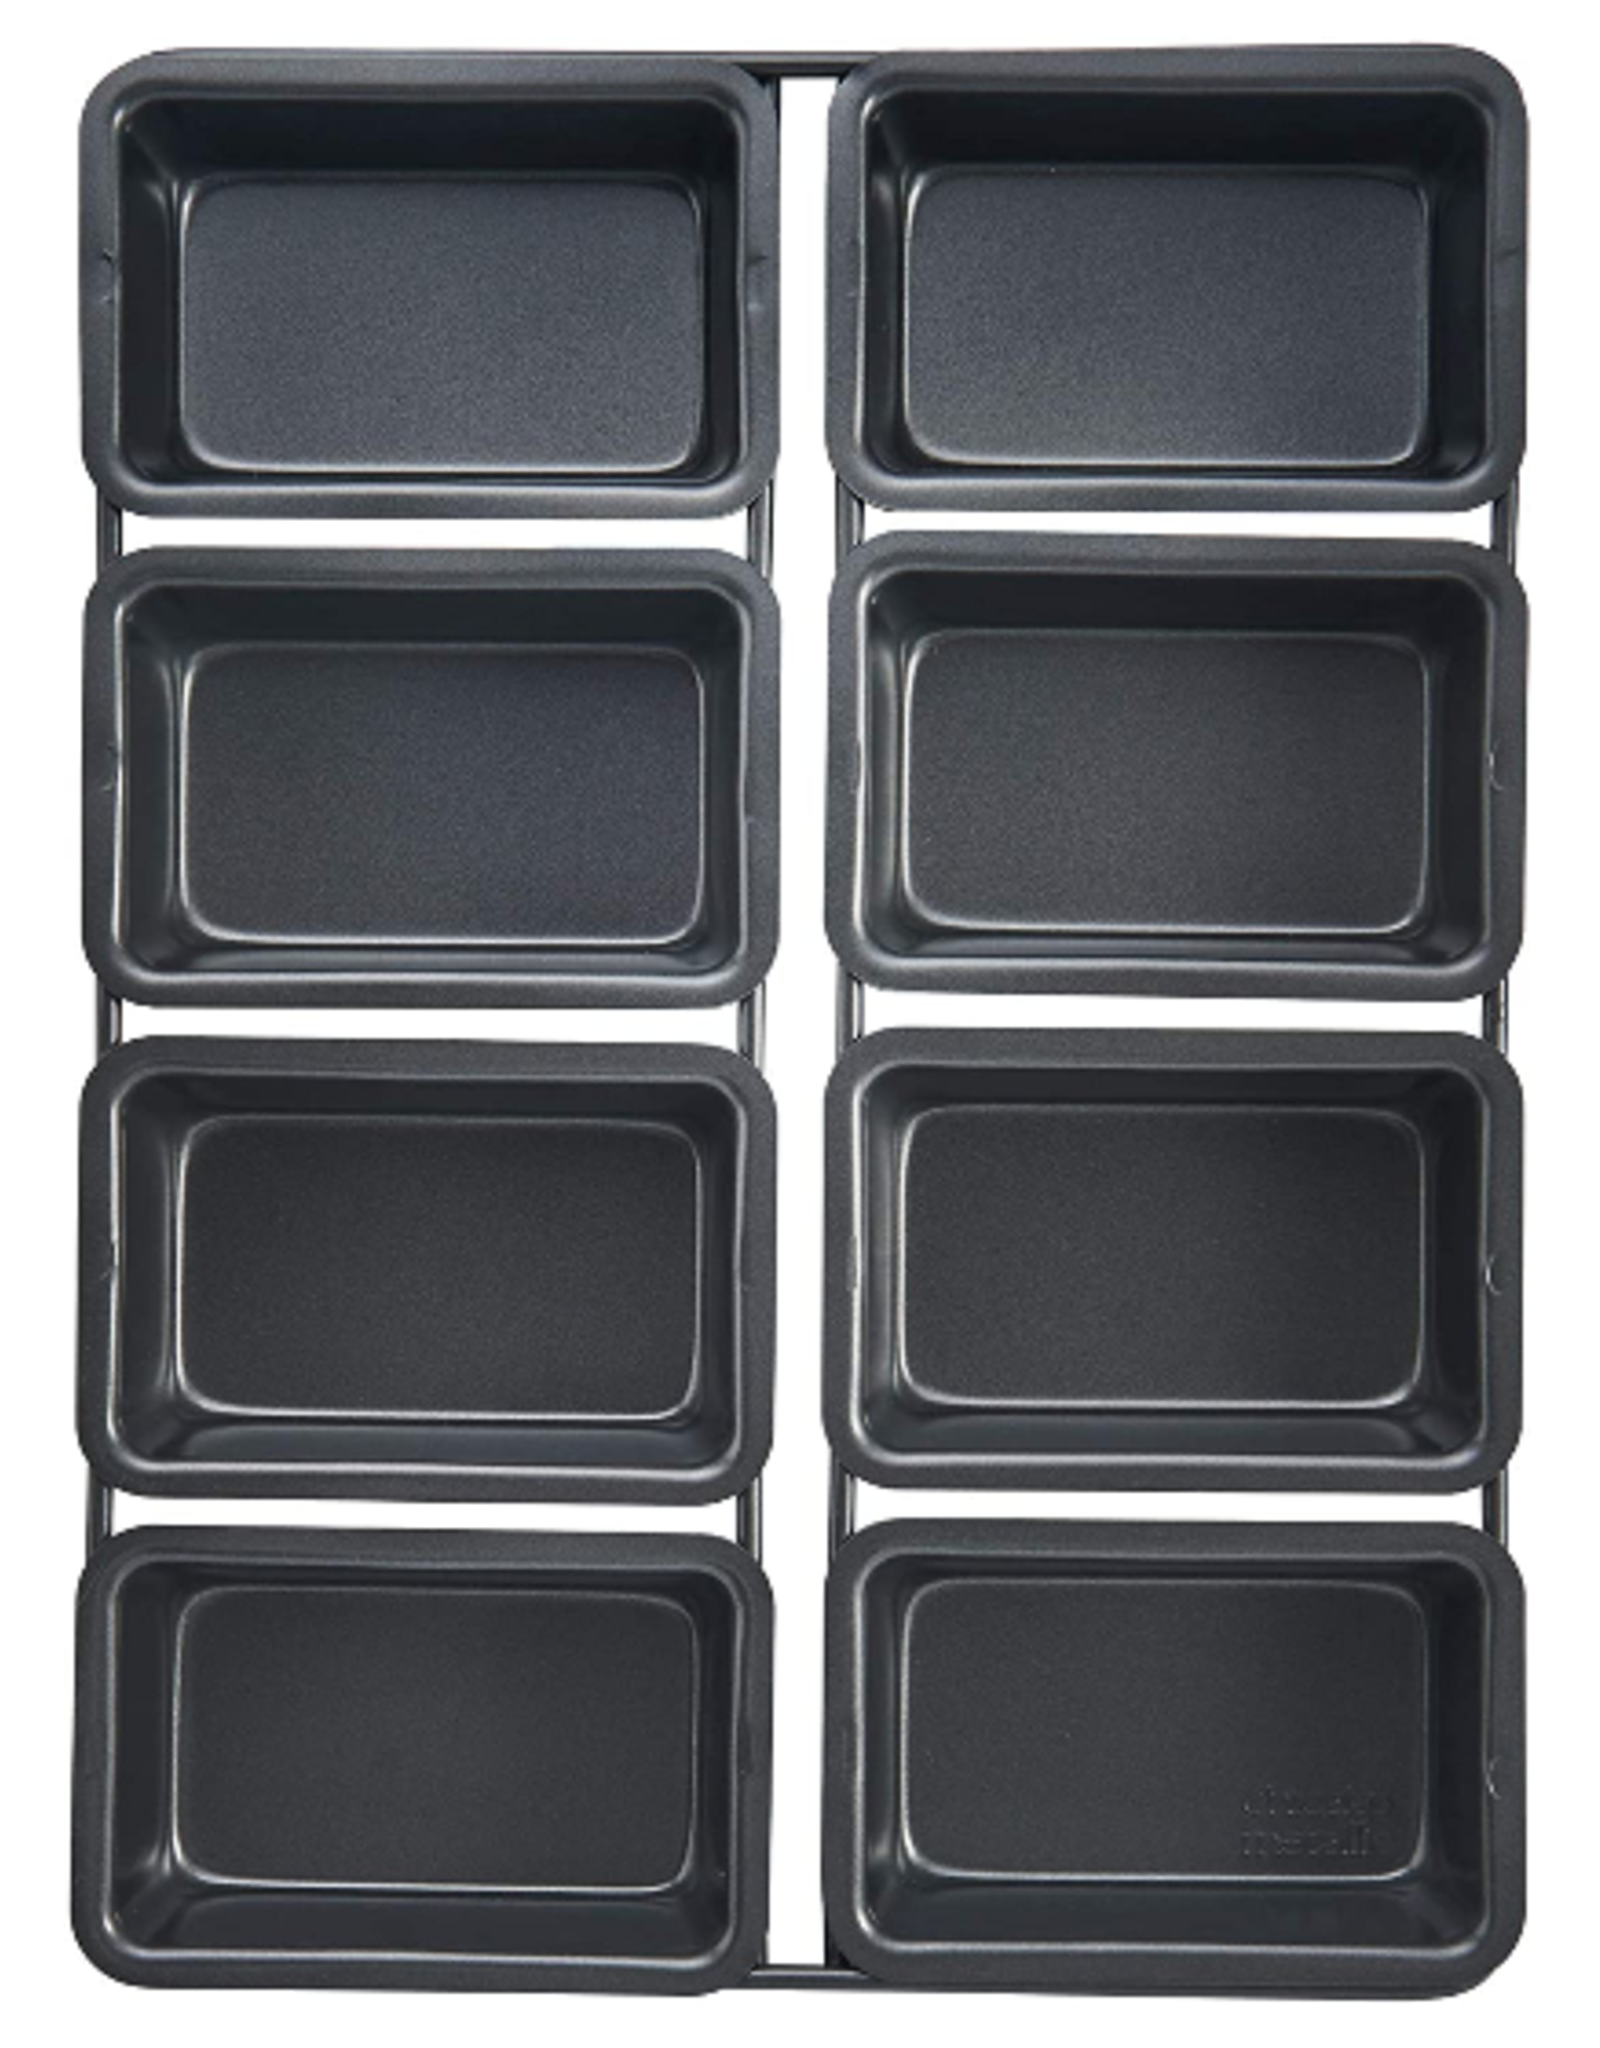 Chicago Metallic ChicMet Linked Mini Loaf Pan